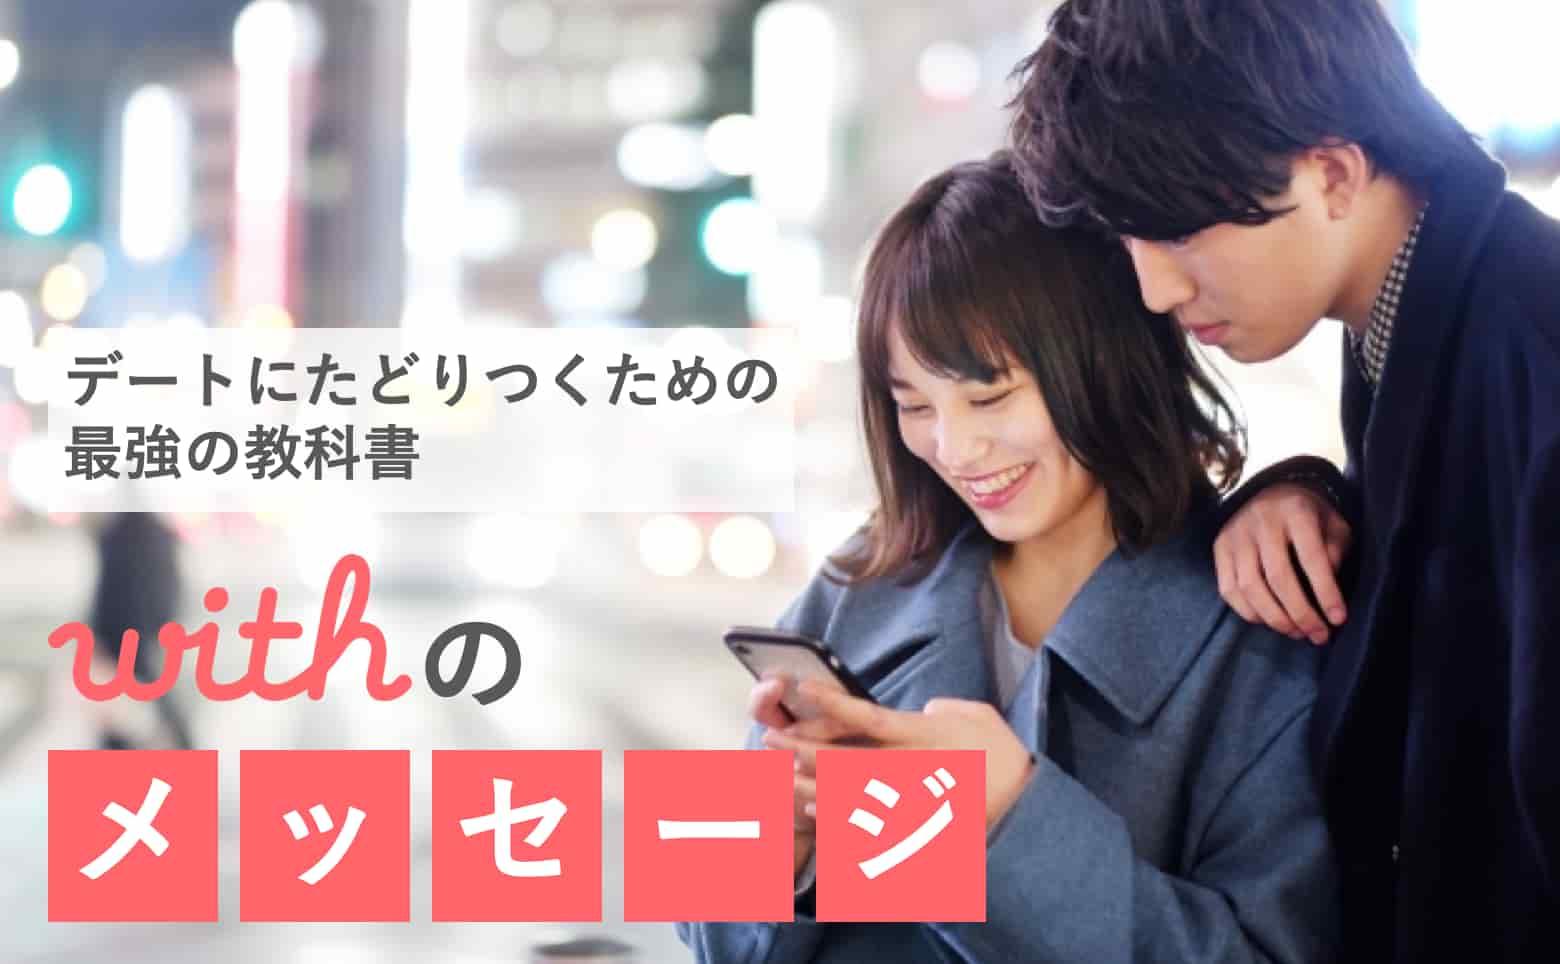 withメッセージ記事アイキャッチ